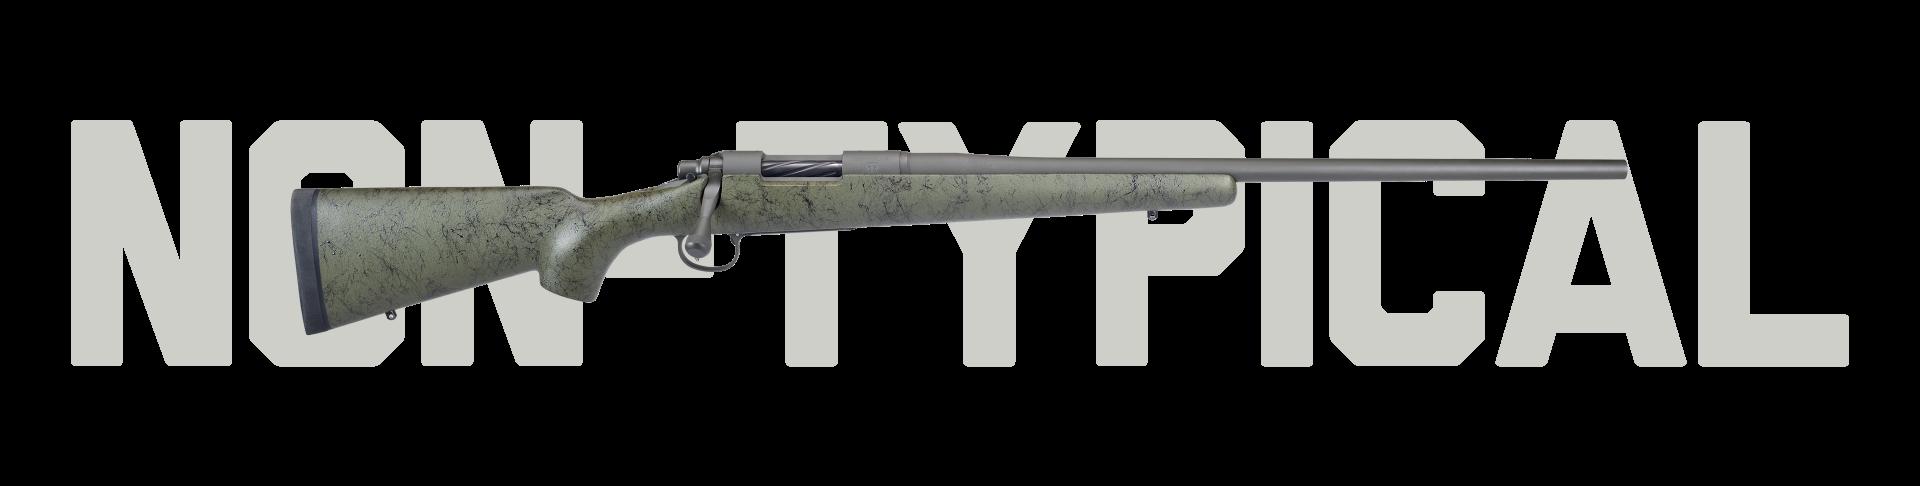 G A  Precision - Professional Quality Rifles & Equipment